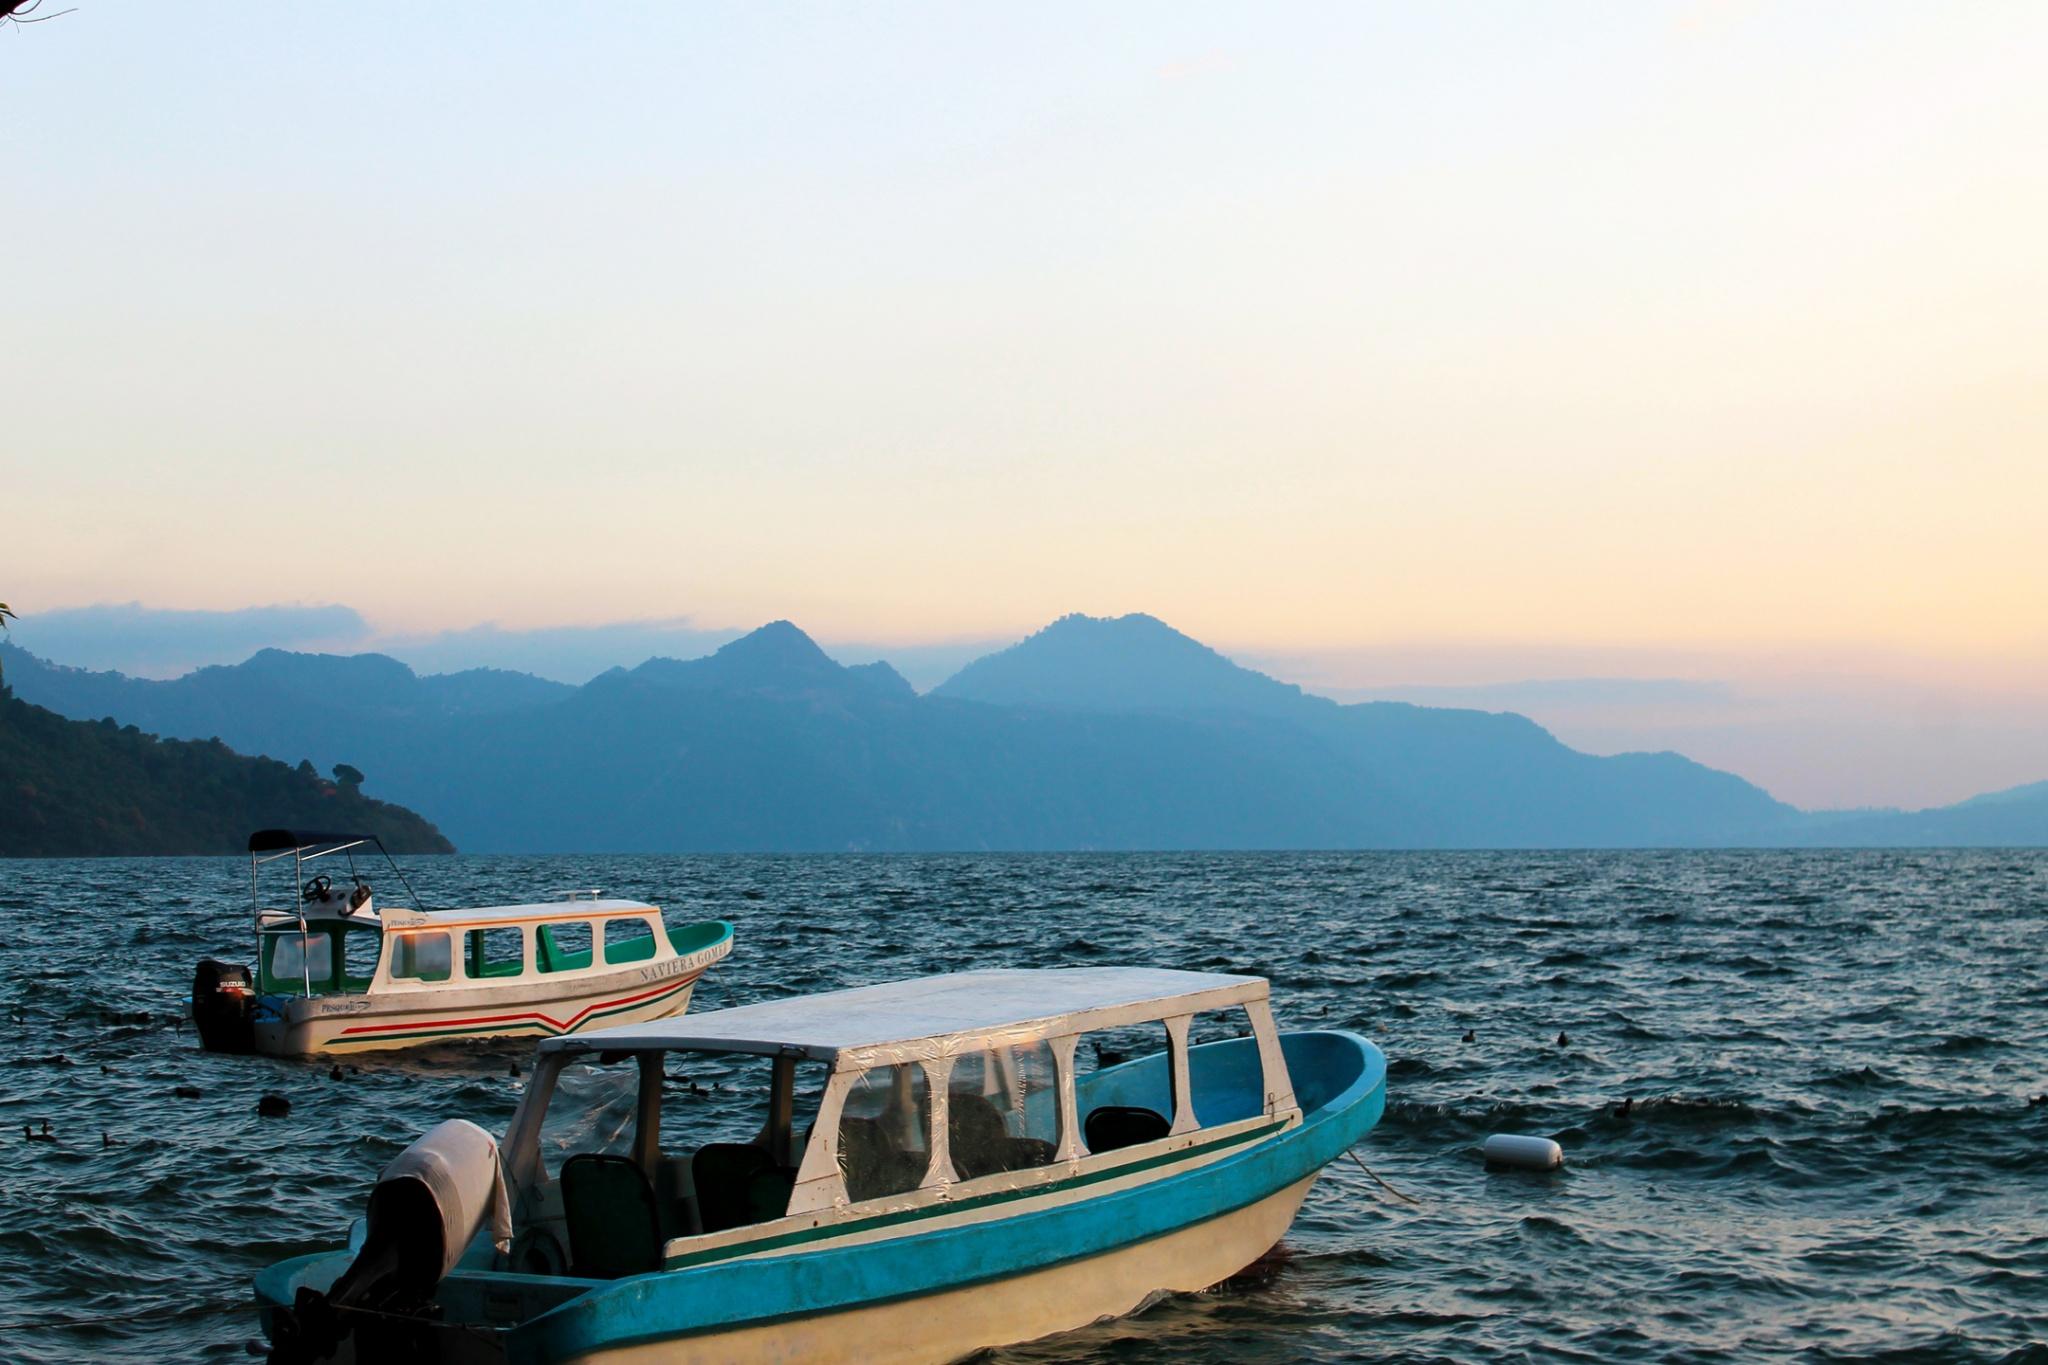 Small boats or lanchas on the shores of Lake Atitlan at sunset. Guatemlala.